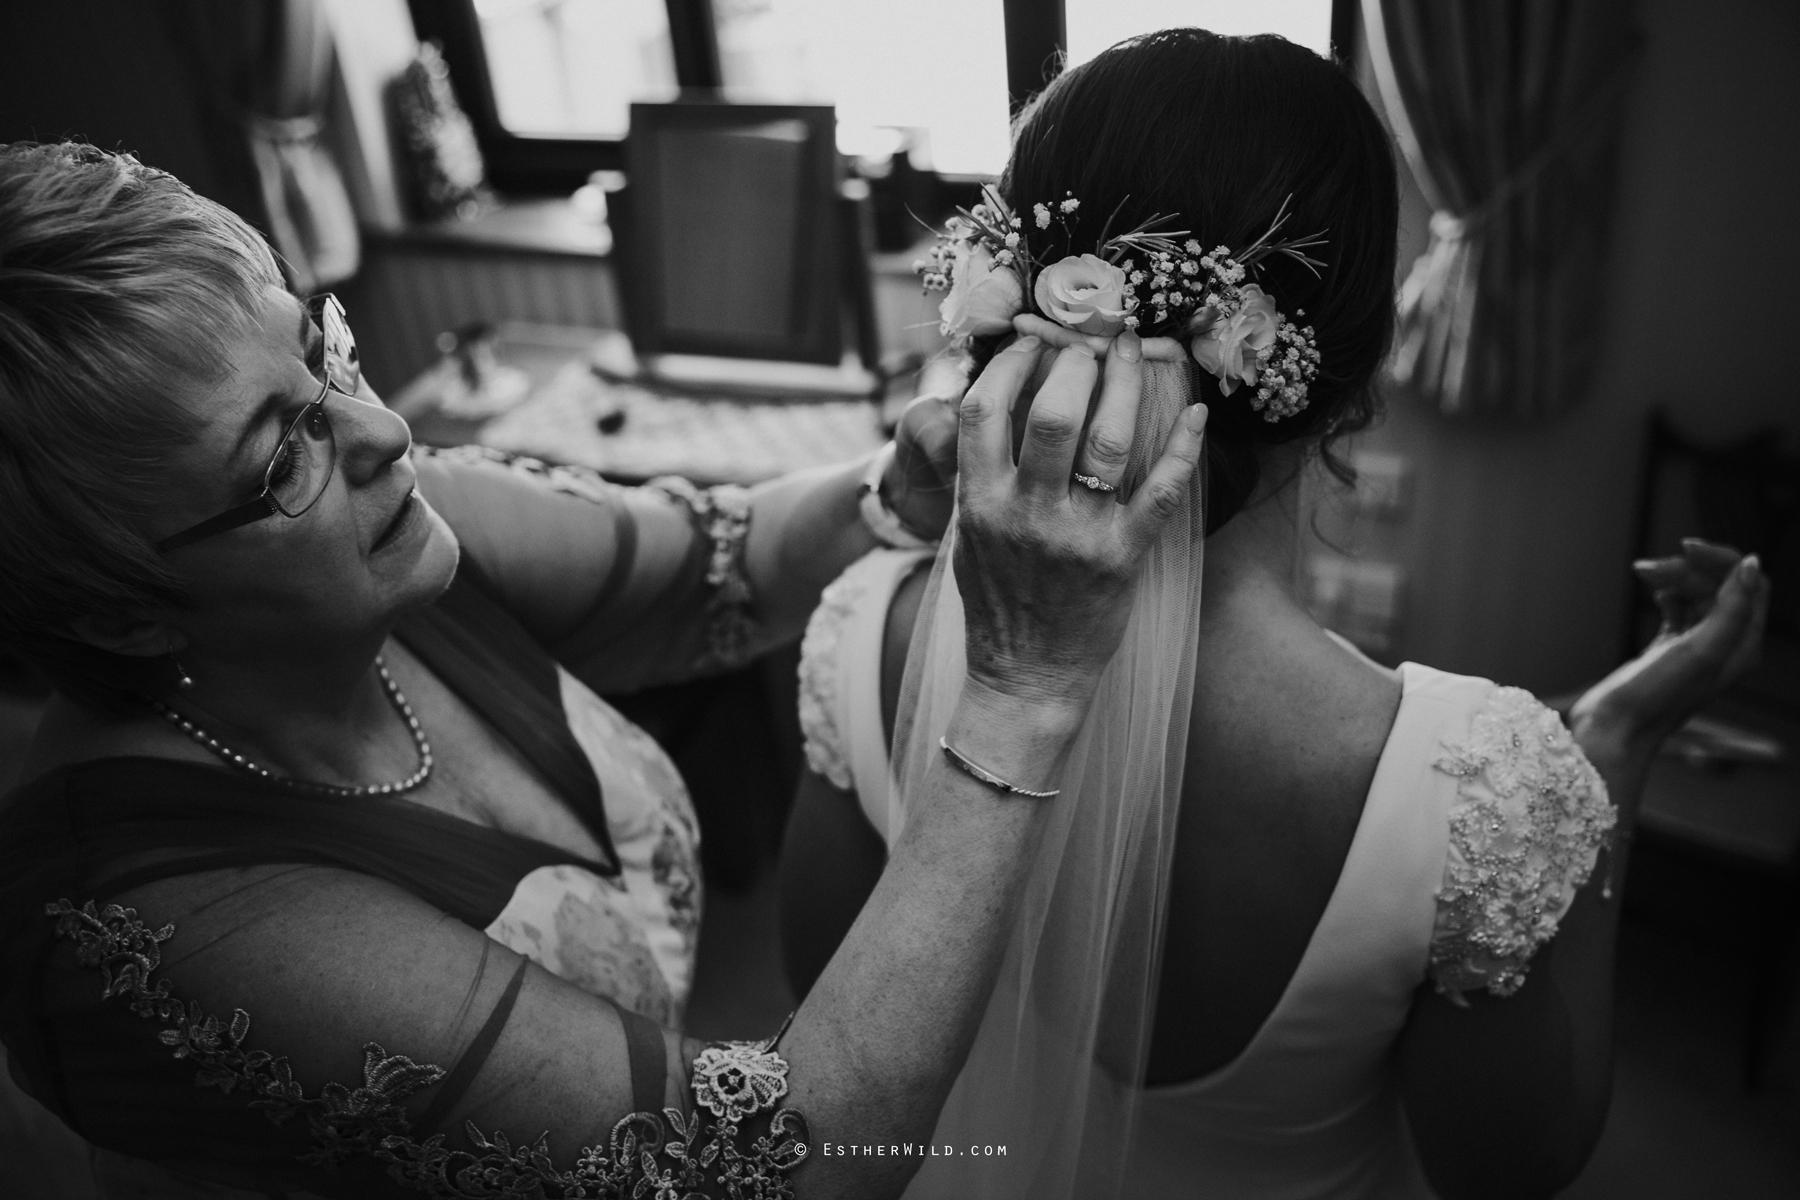 Wootton_Wedding_Copyright_Esther_Wild_Photographer_IMG_0561-2.jpg